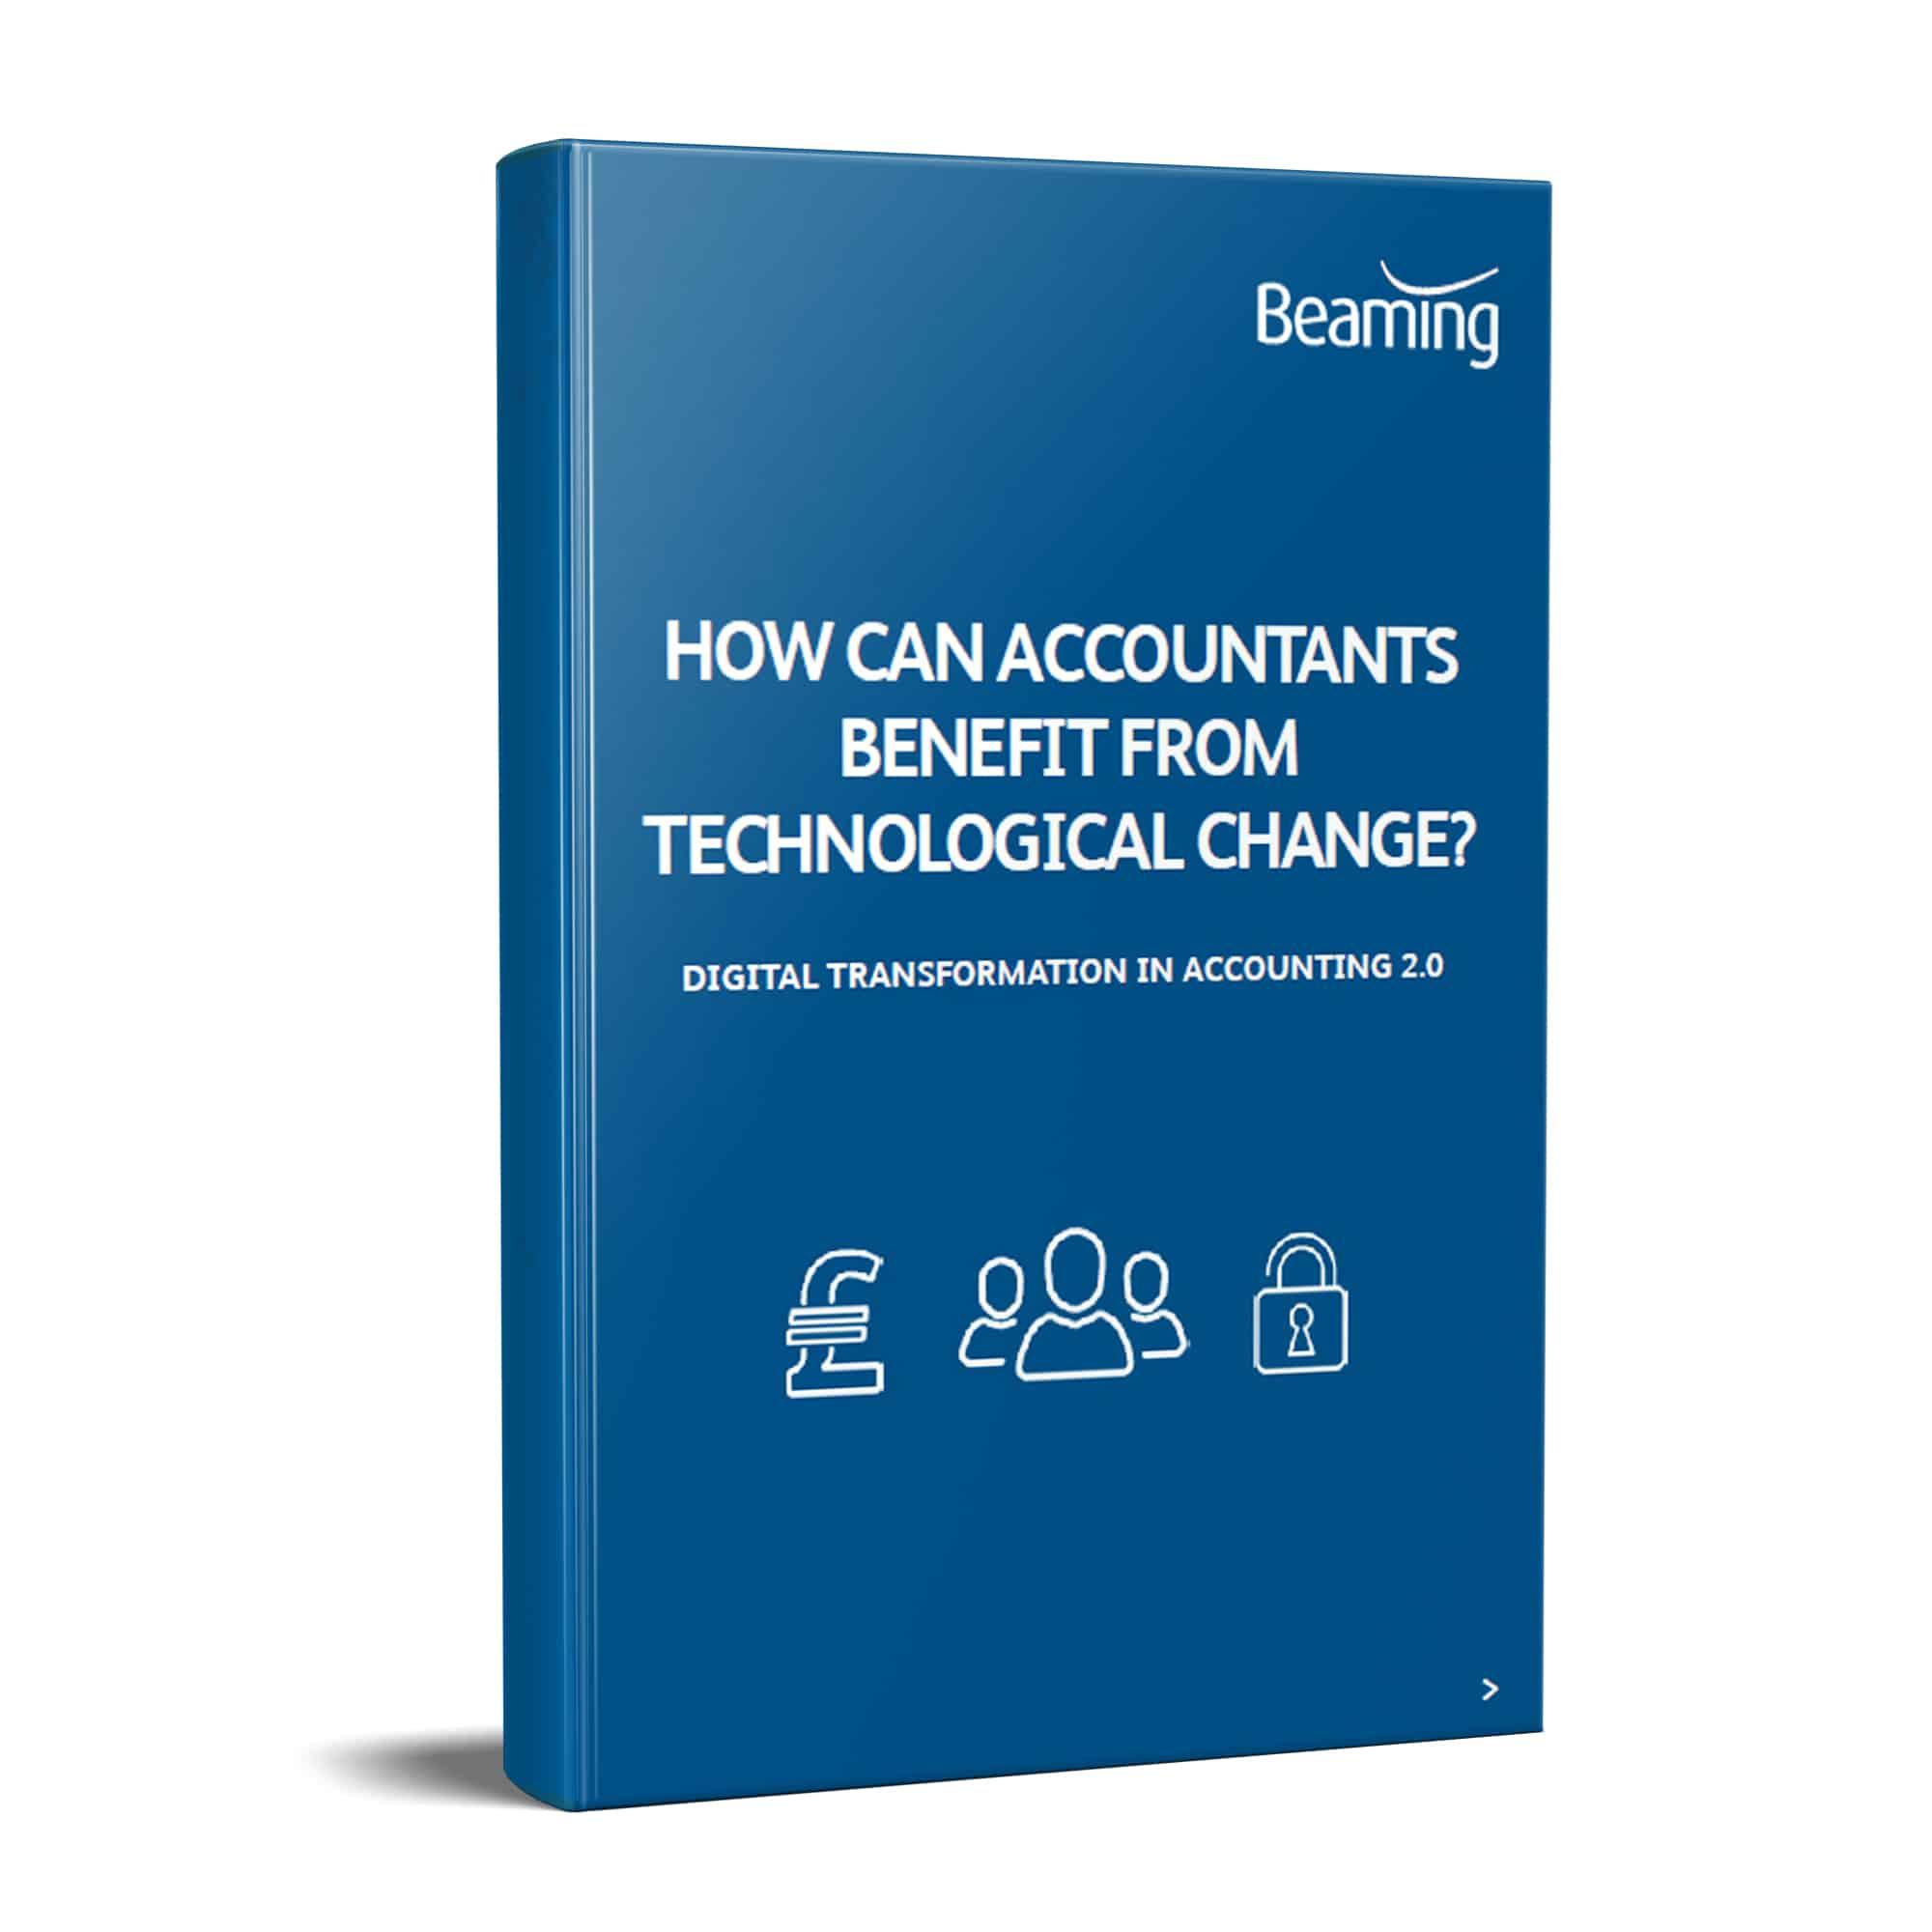 Digital Transformation in Accounting